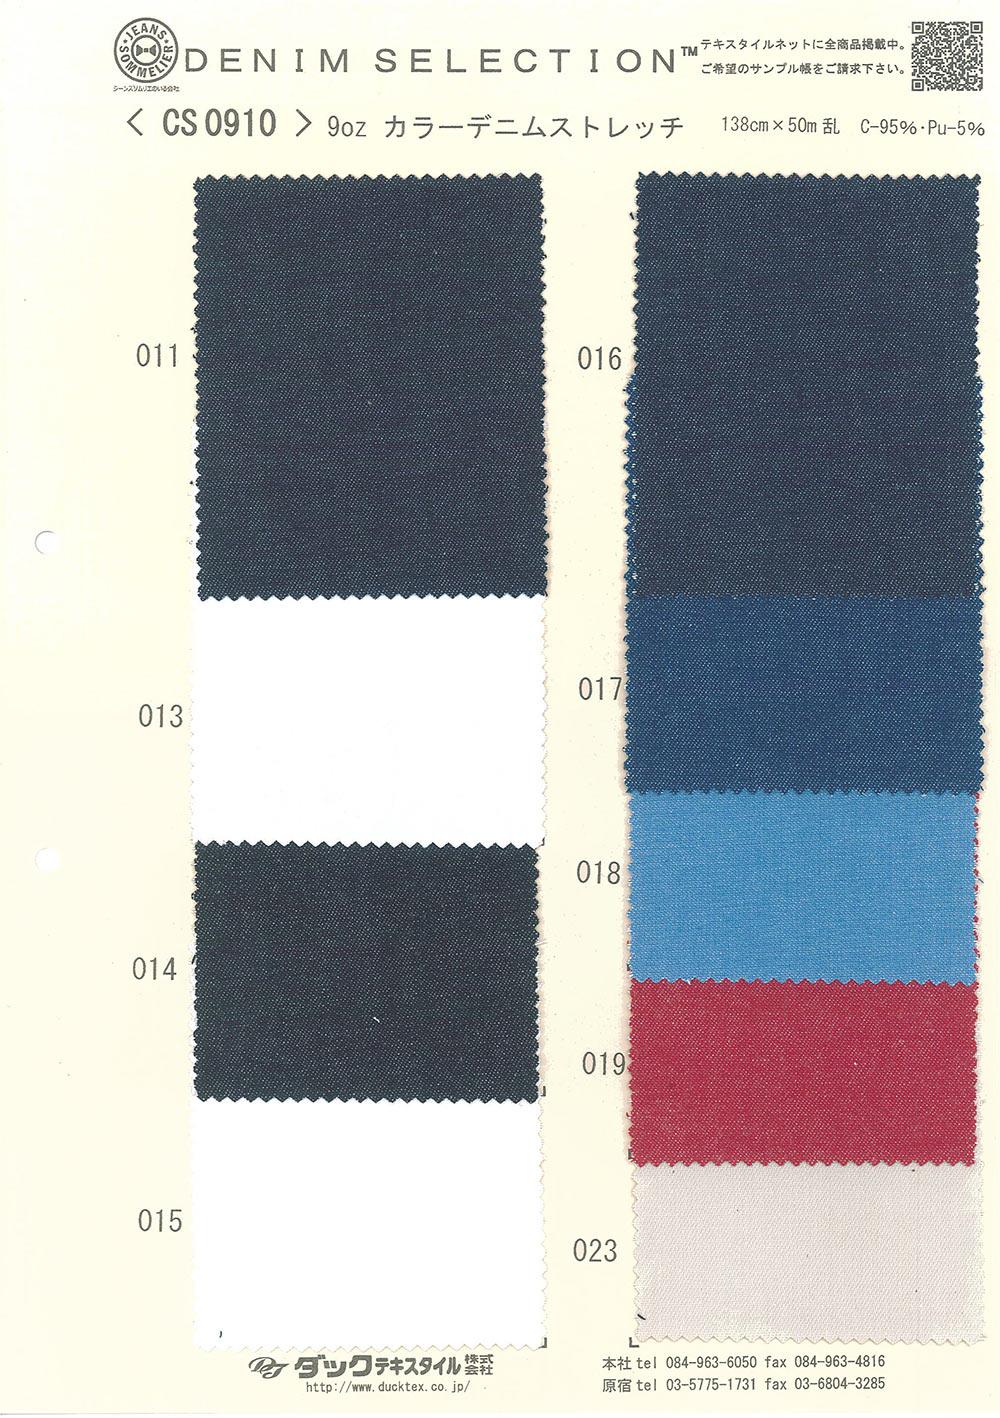 CS0910 9オンスカラーデニムストレッチ[生地] ダックテキスタイル/オークラ商事 - ApparelX アパレル資材卸通販